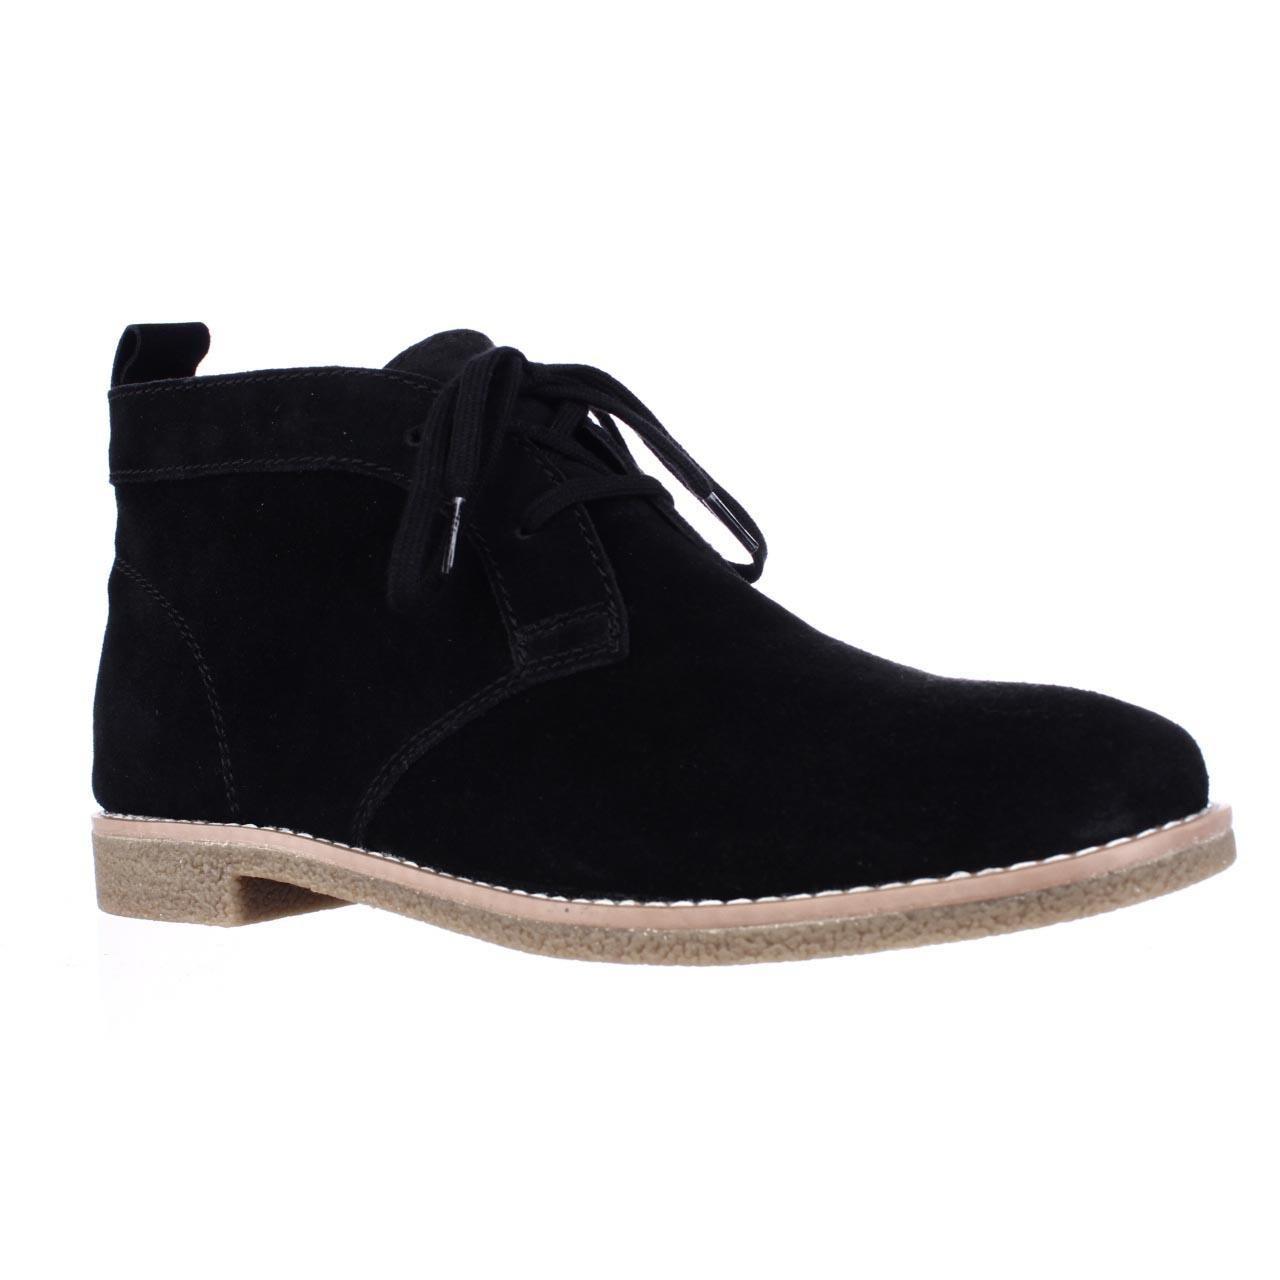 tommy hilfiger blaze chukka boots in black lyst. Black Bedroom Furniture Sets. Home Design Ideas